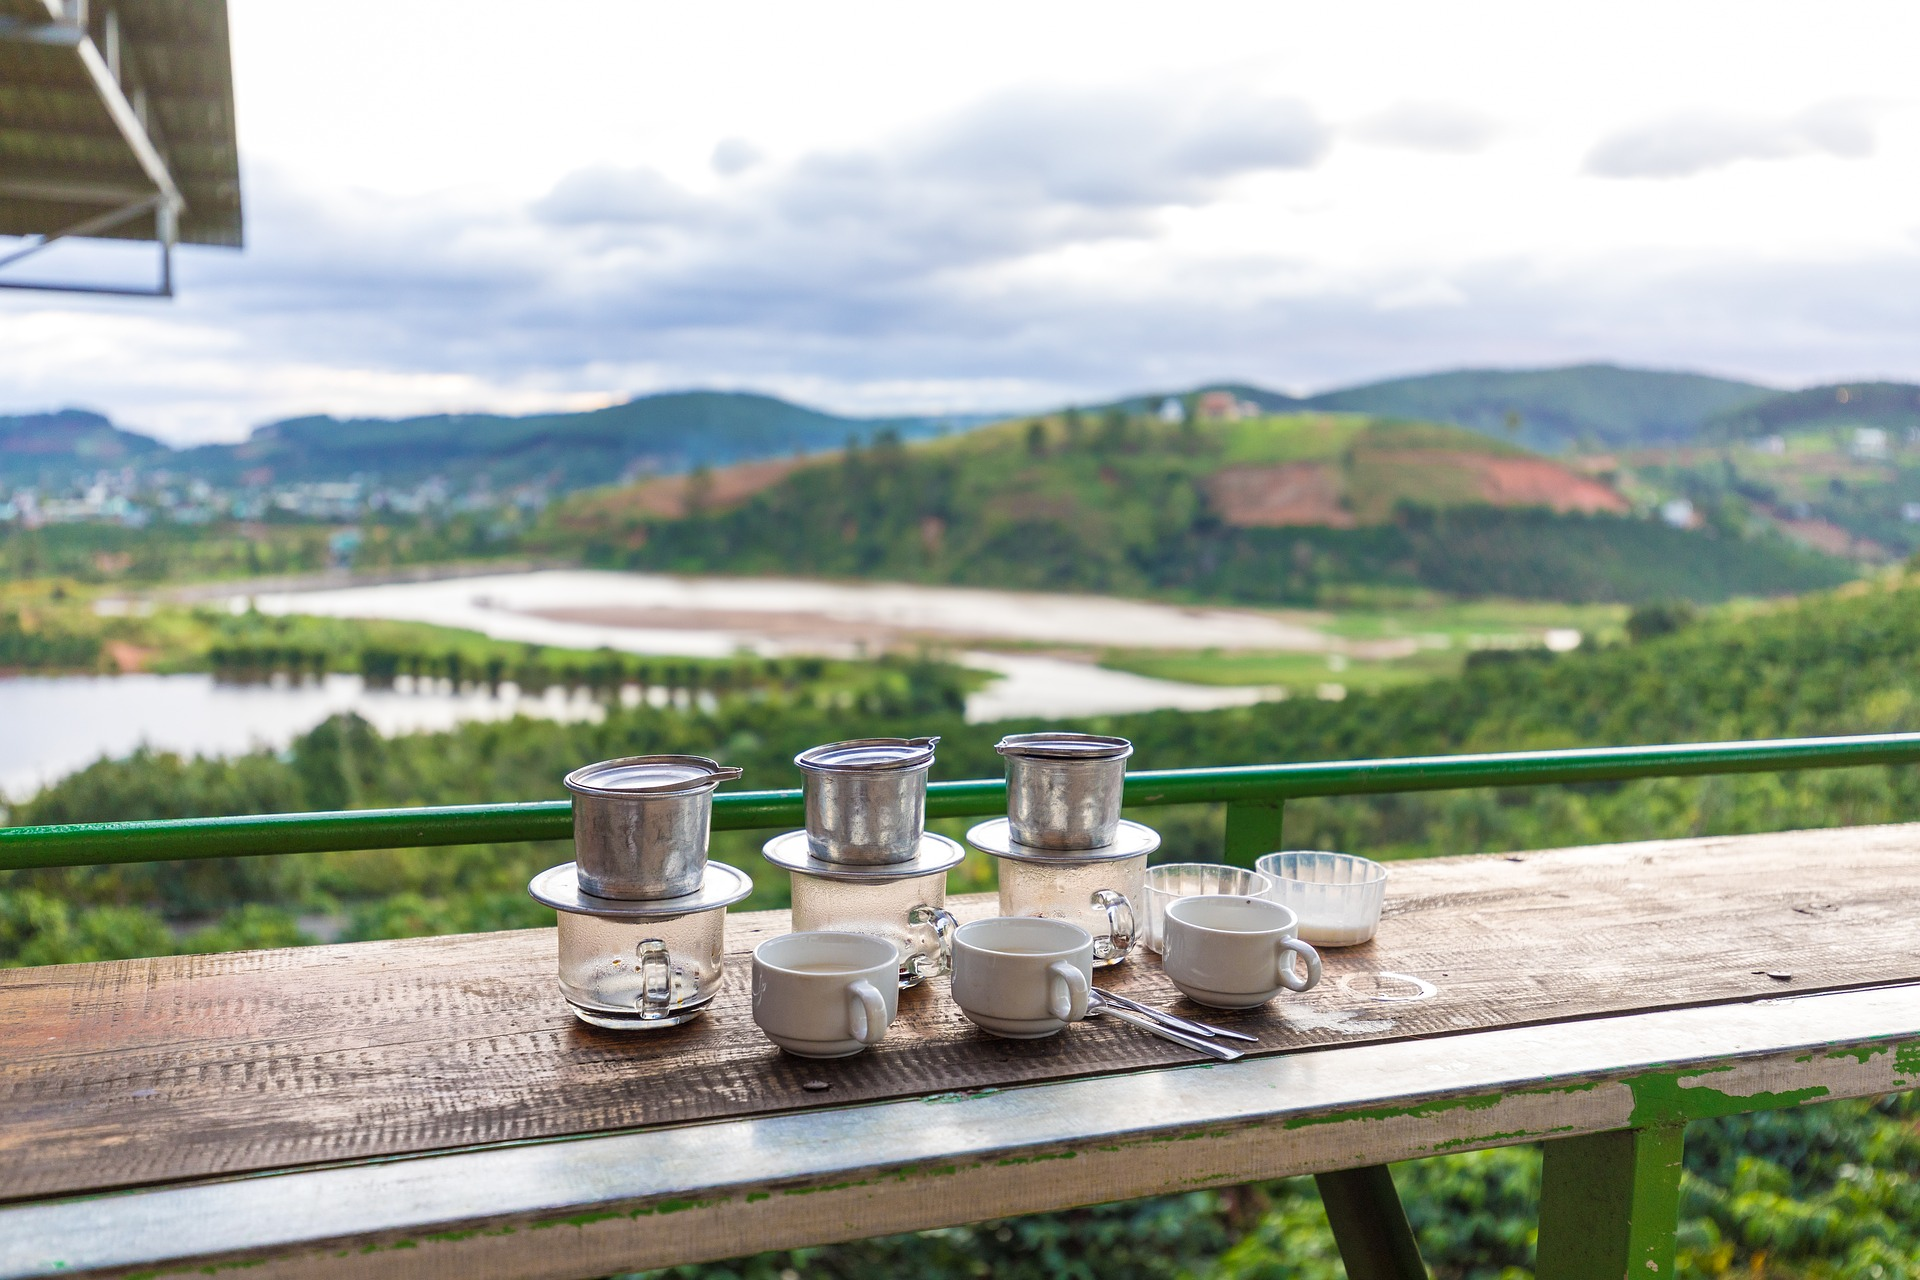 phin coffee with views of a coffee plantation via Pixabay